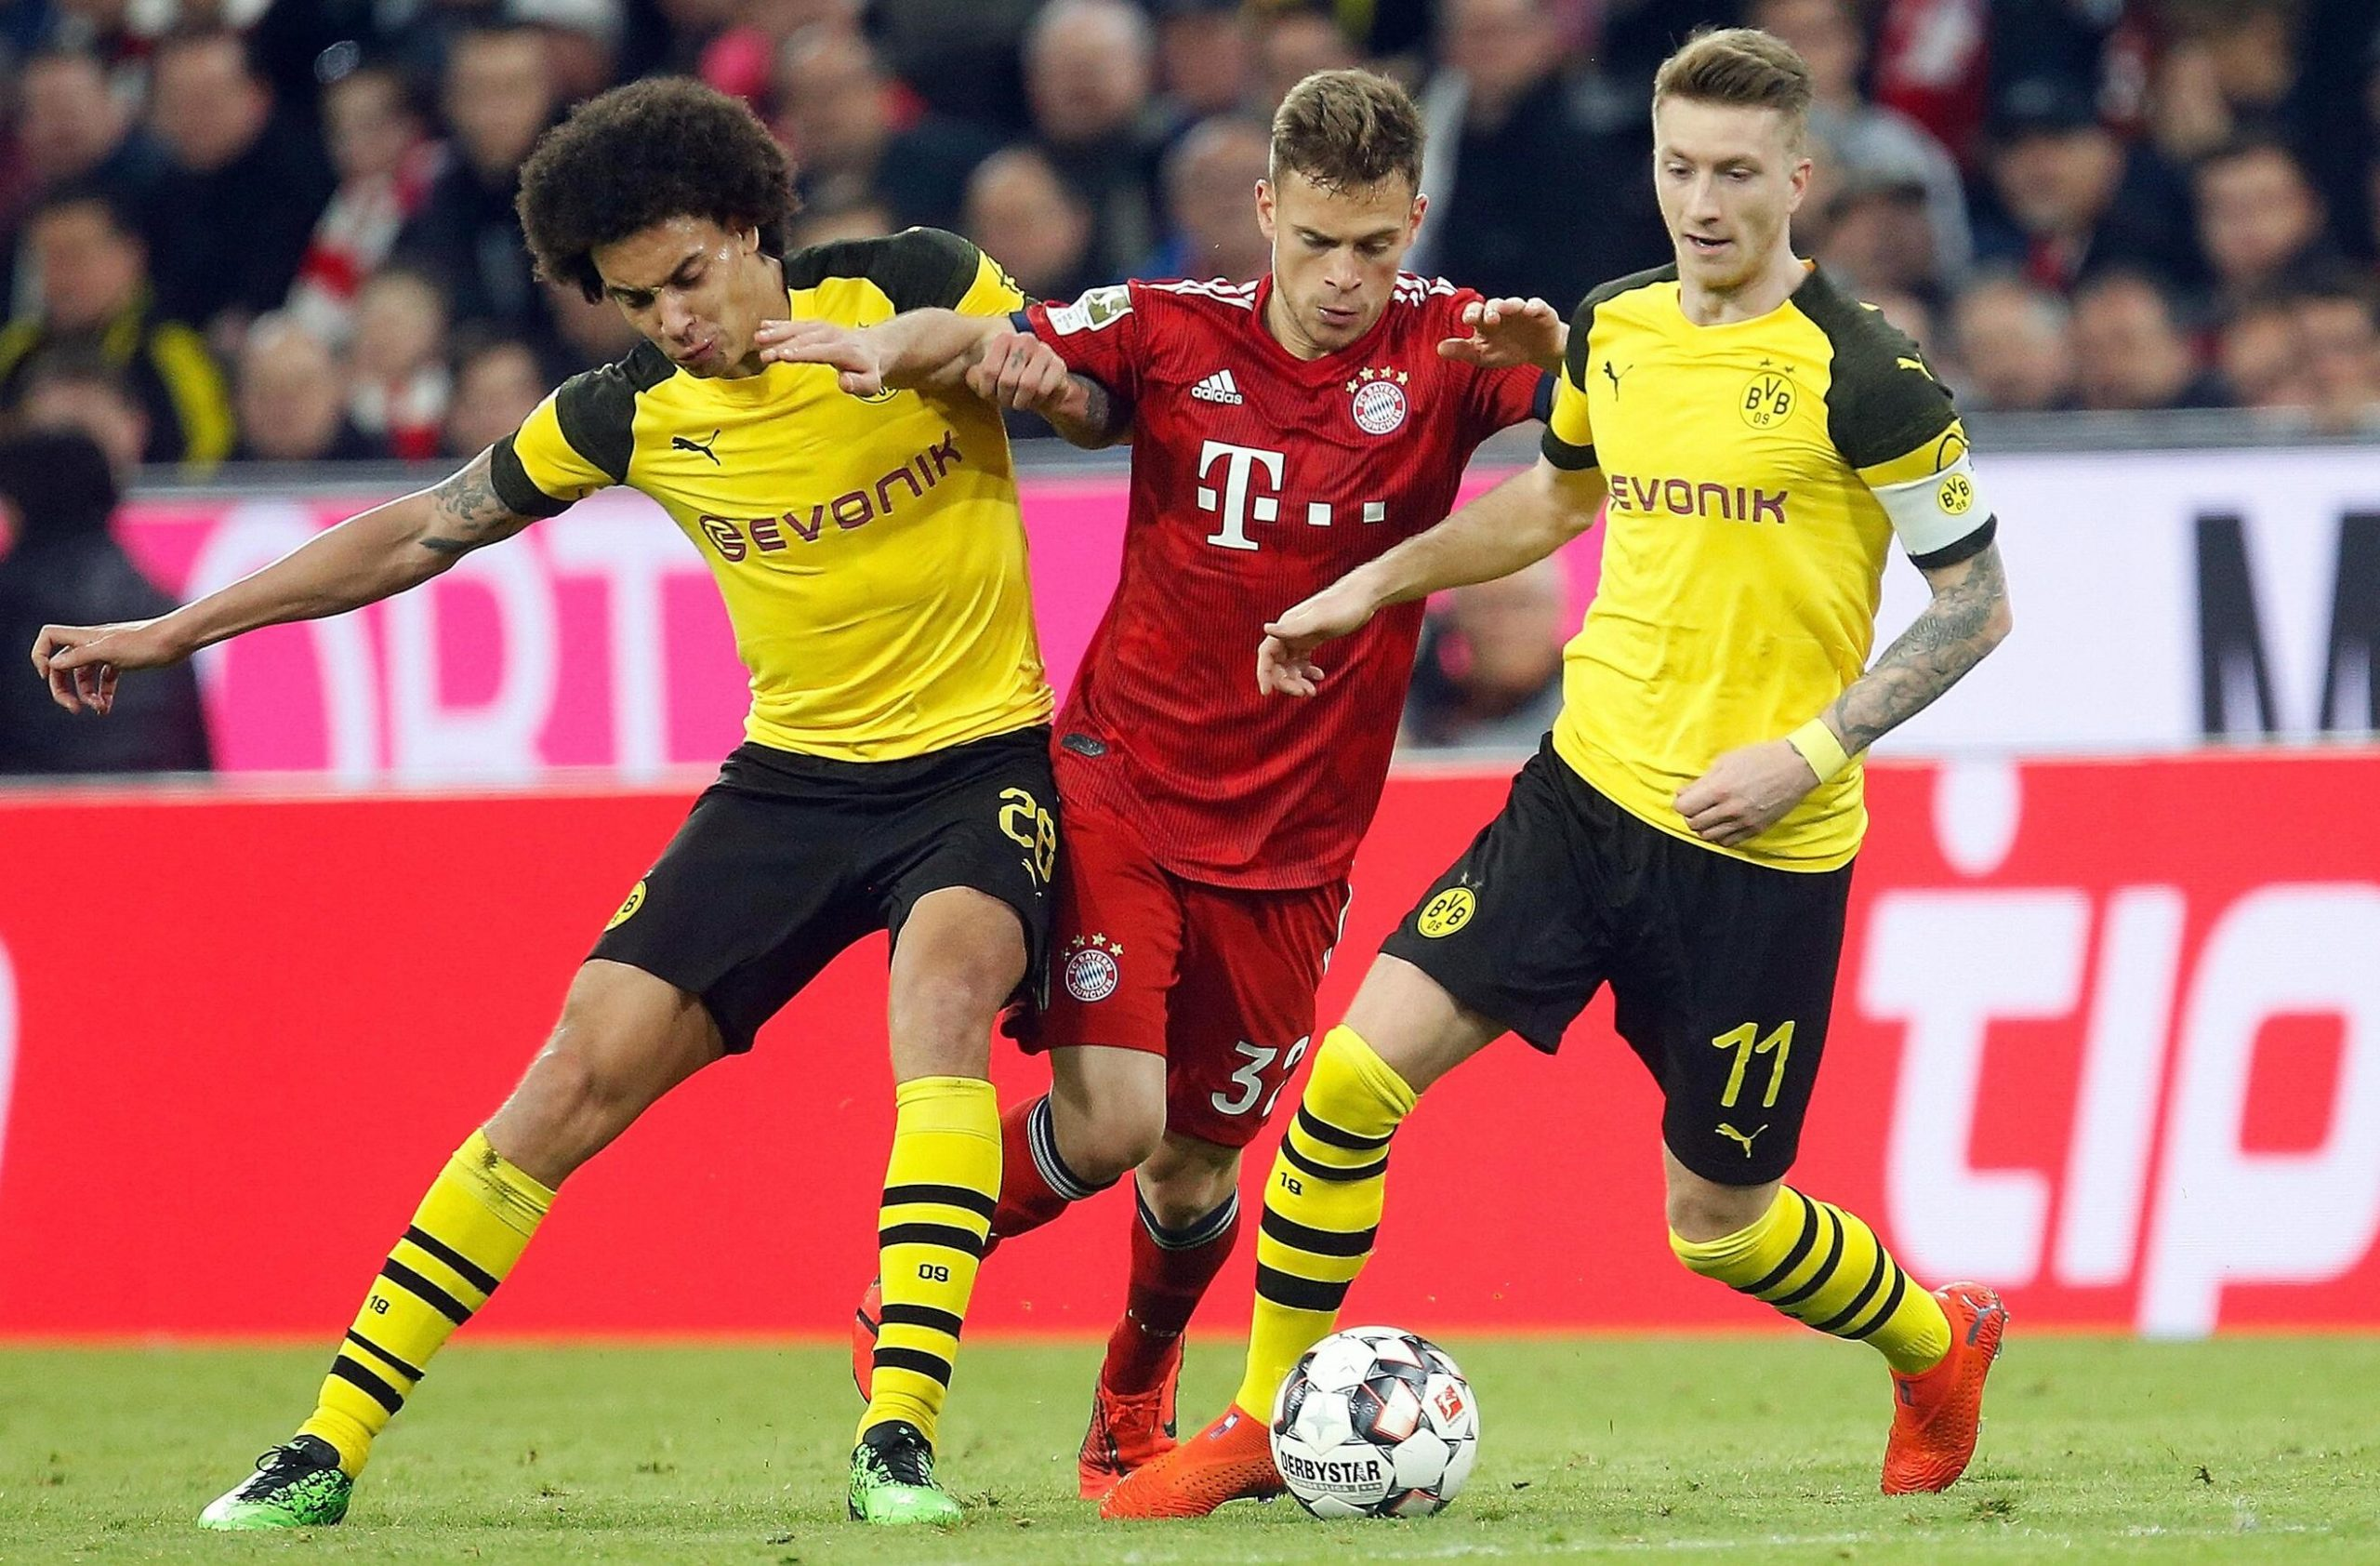 Prognoza za Dortmund-Bayern Betinum.com